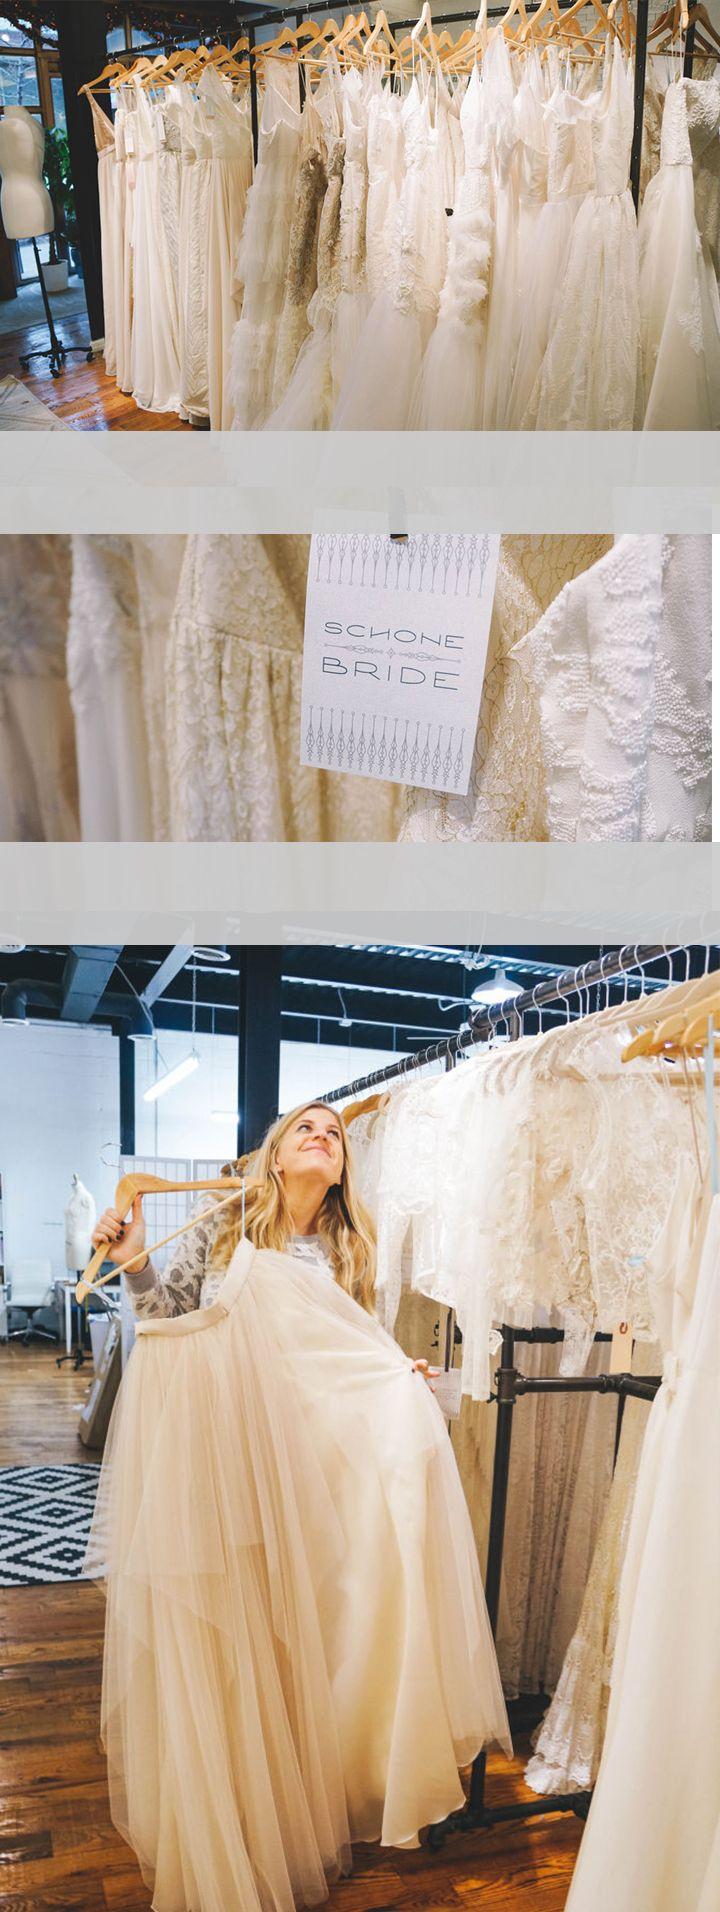 Wedding dresses brooklyn  Schone Bride Studio Tour  Classic weddings Boho and Wedding dress